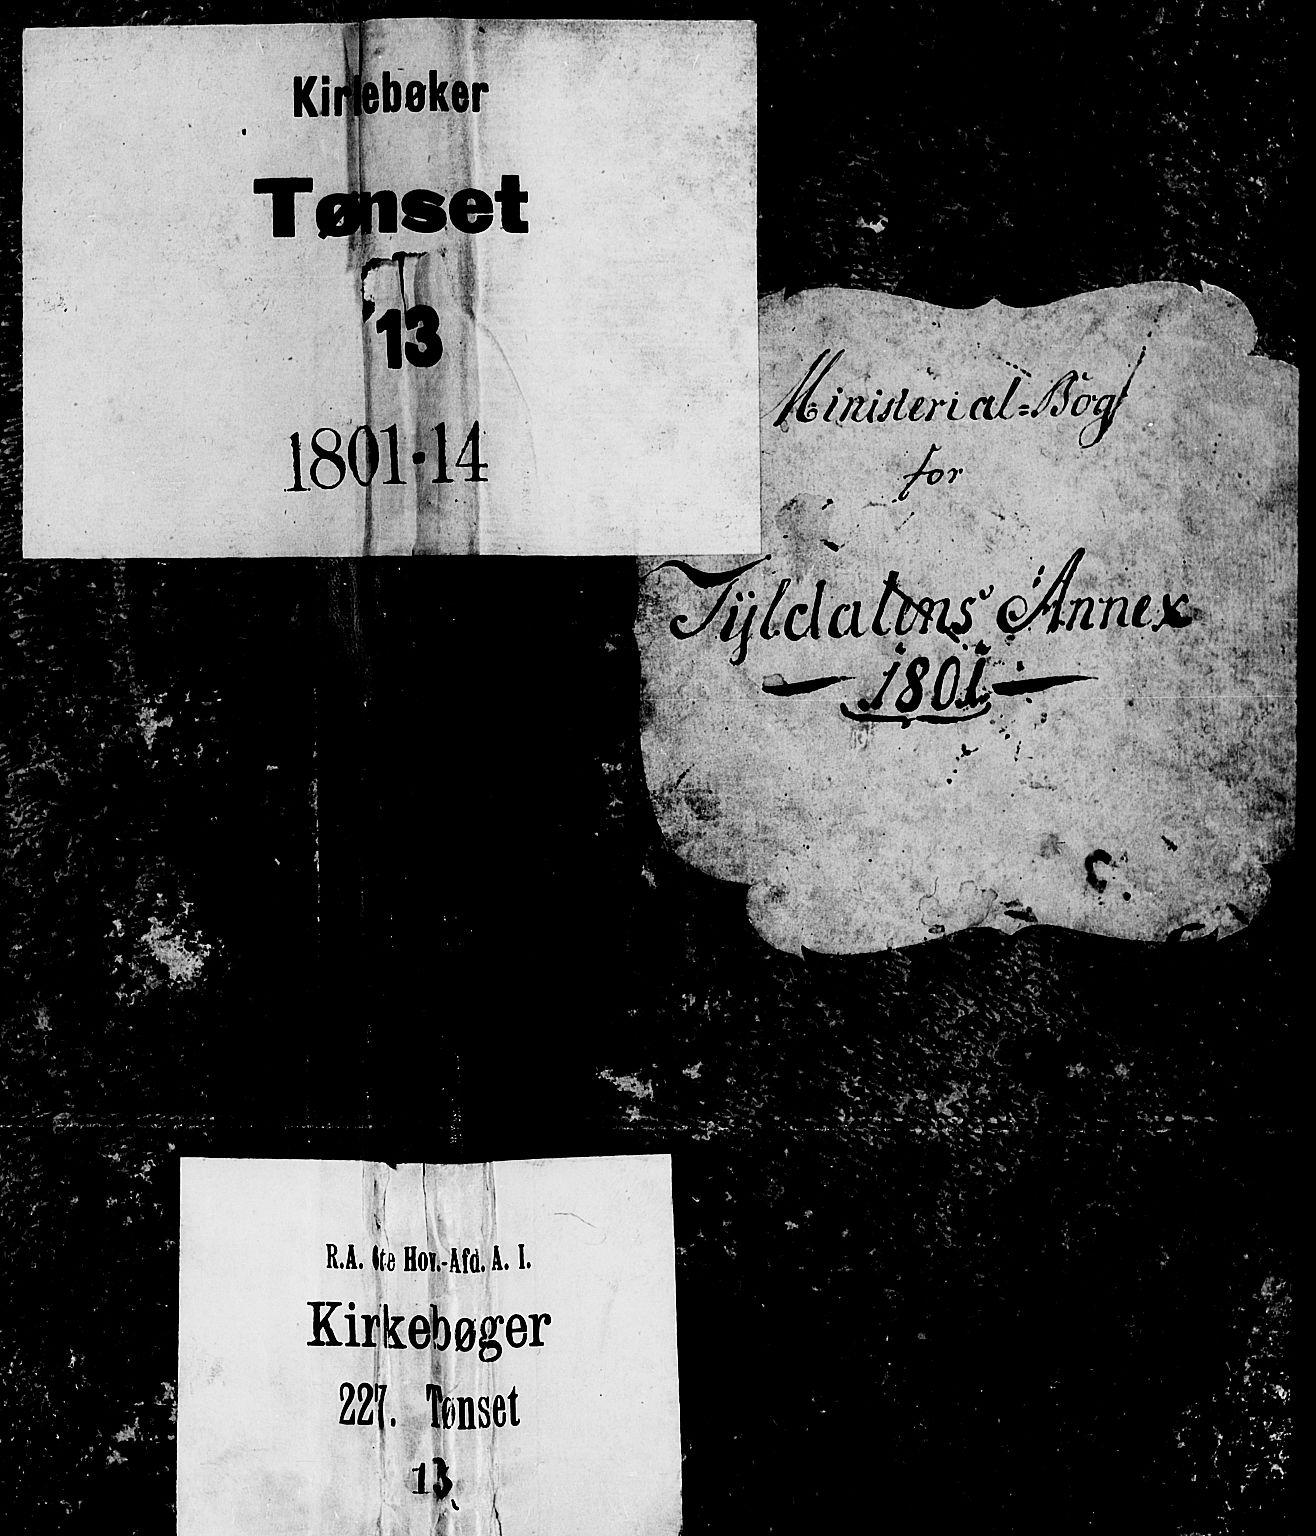 SAH, Tynset prestekontor, Ministerialbok nr. 17, 1801-1814